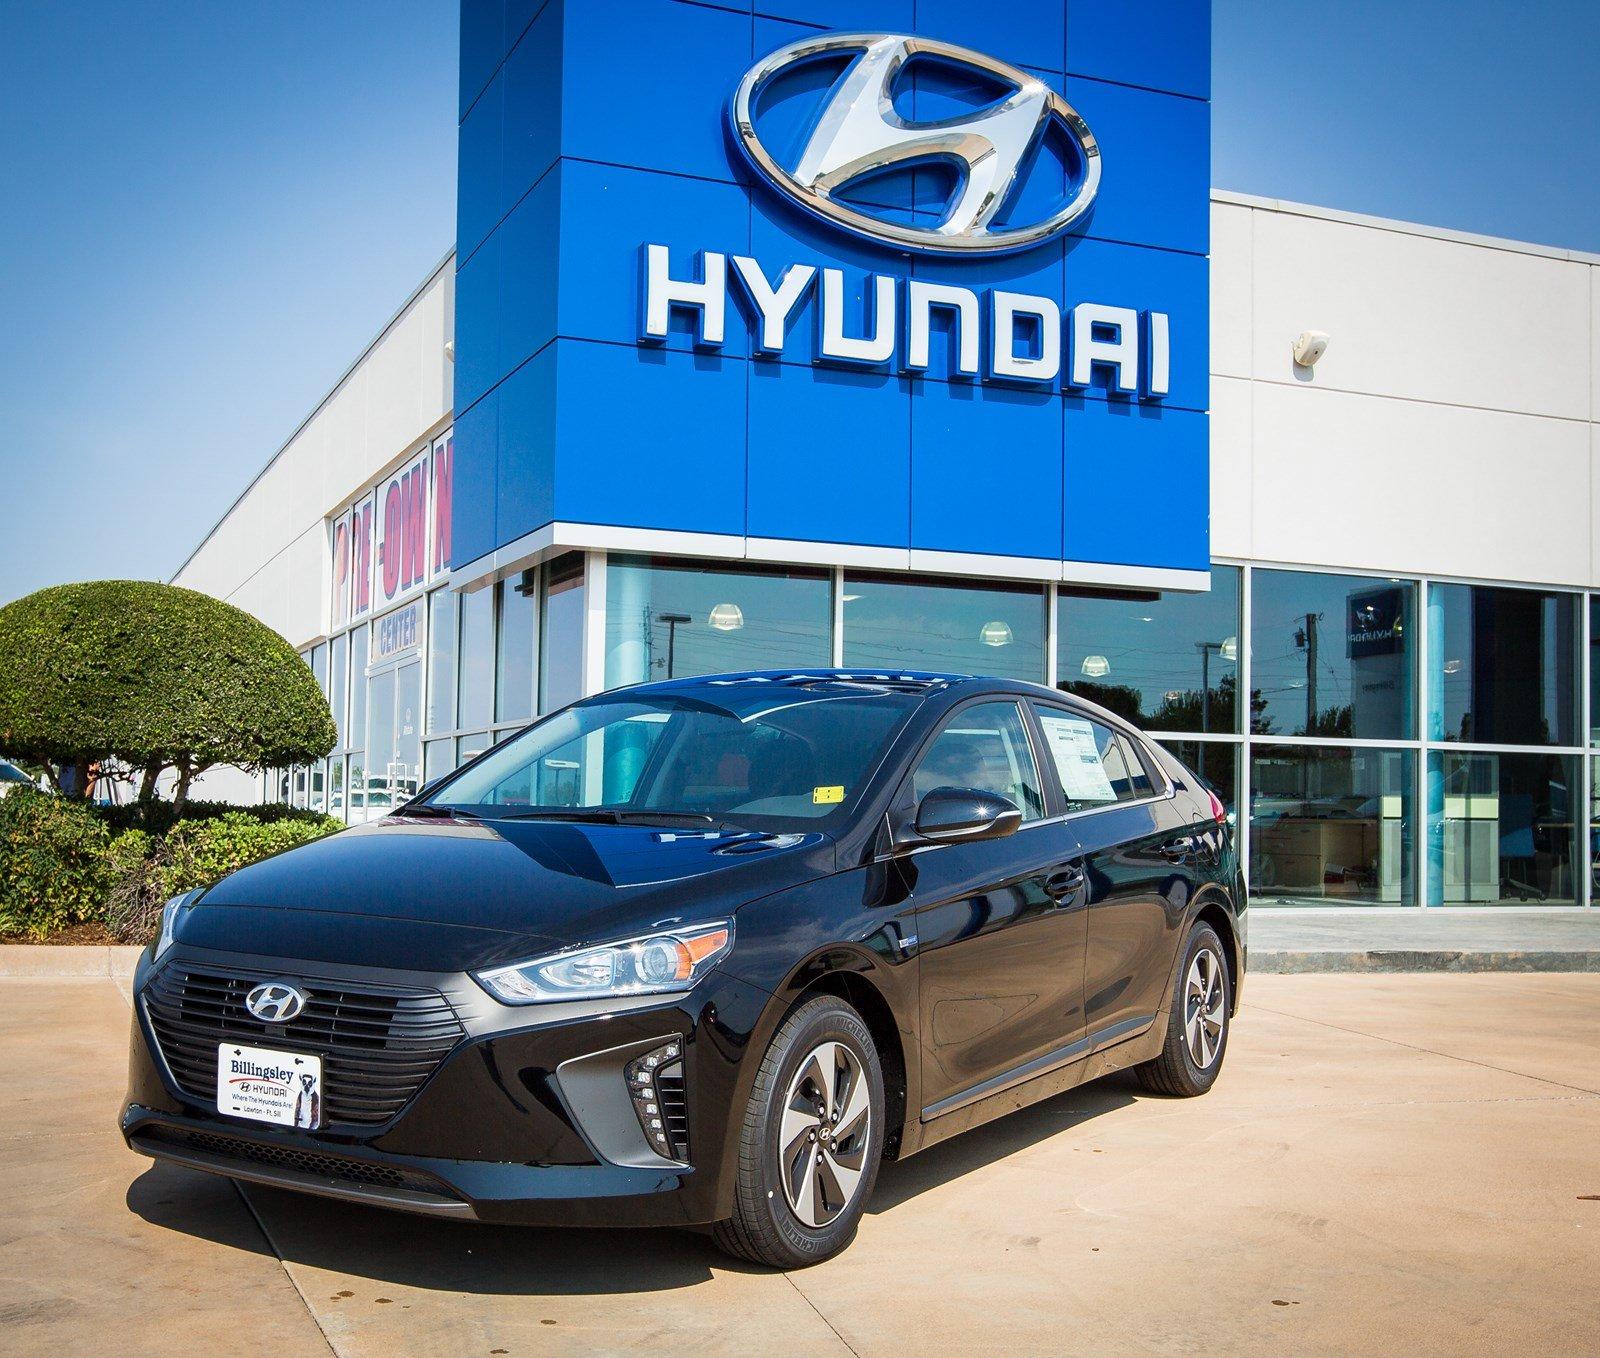 Used special  2018 Hyundai Ioniq Hybrid SEL Hatchback for sale in Lawton, OK